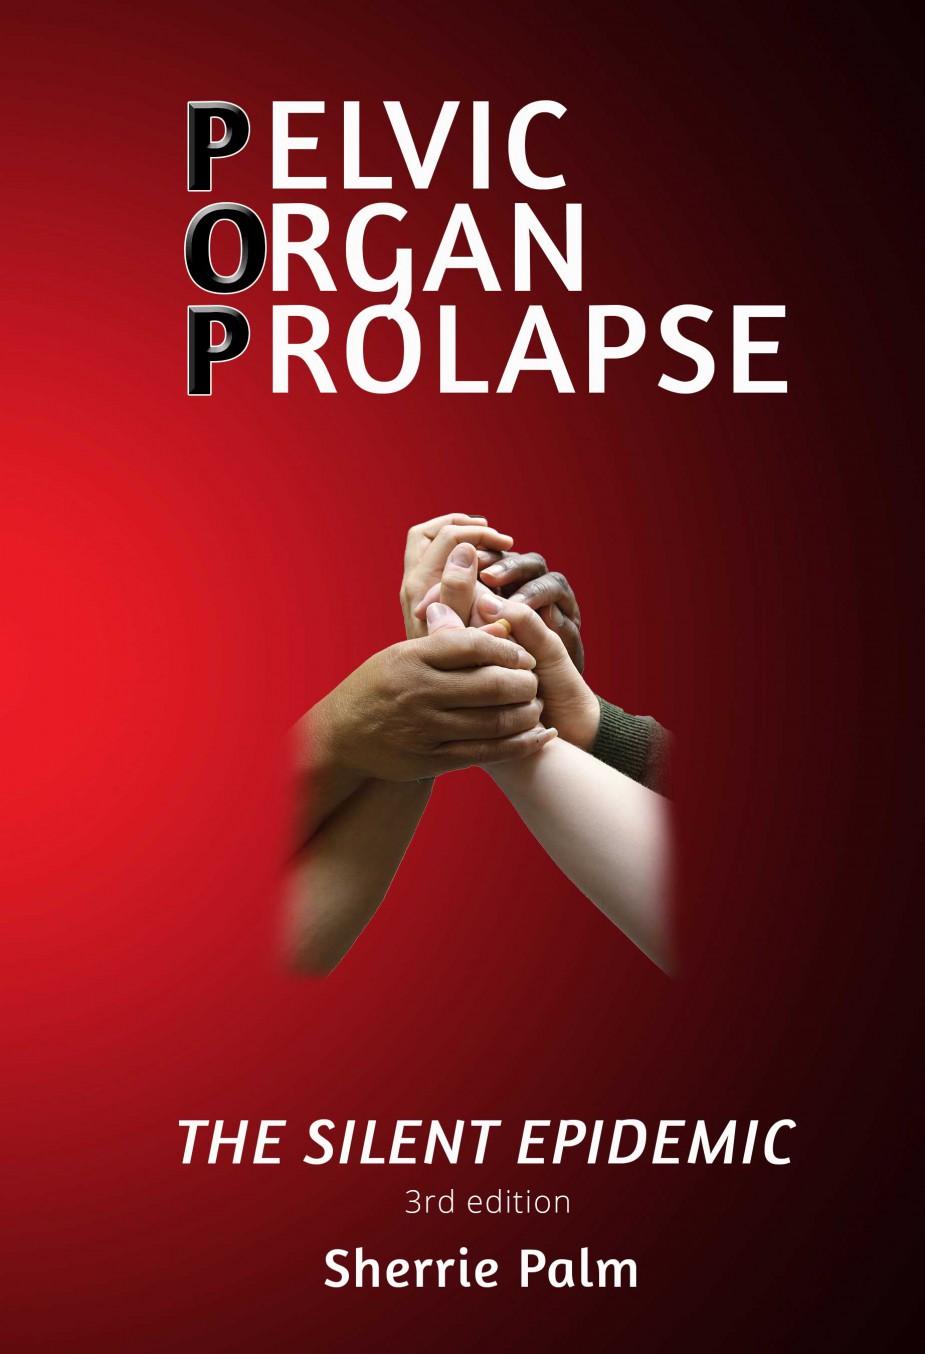 Pelvic Organ Prolapse: The Silent Epidemic